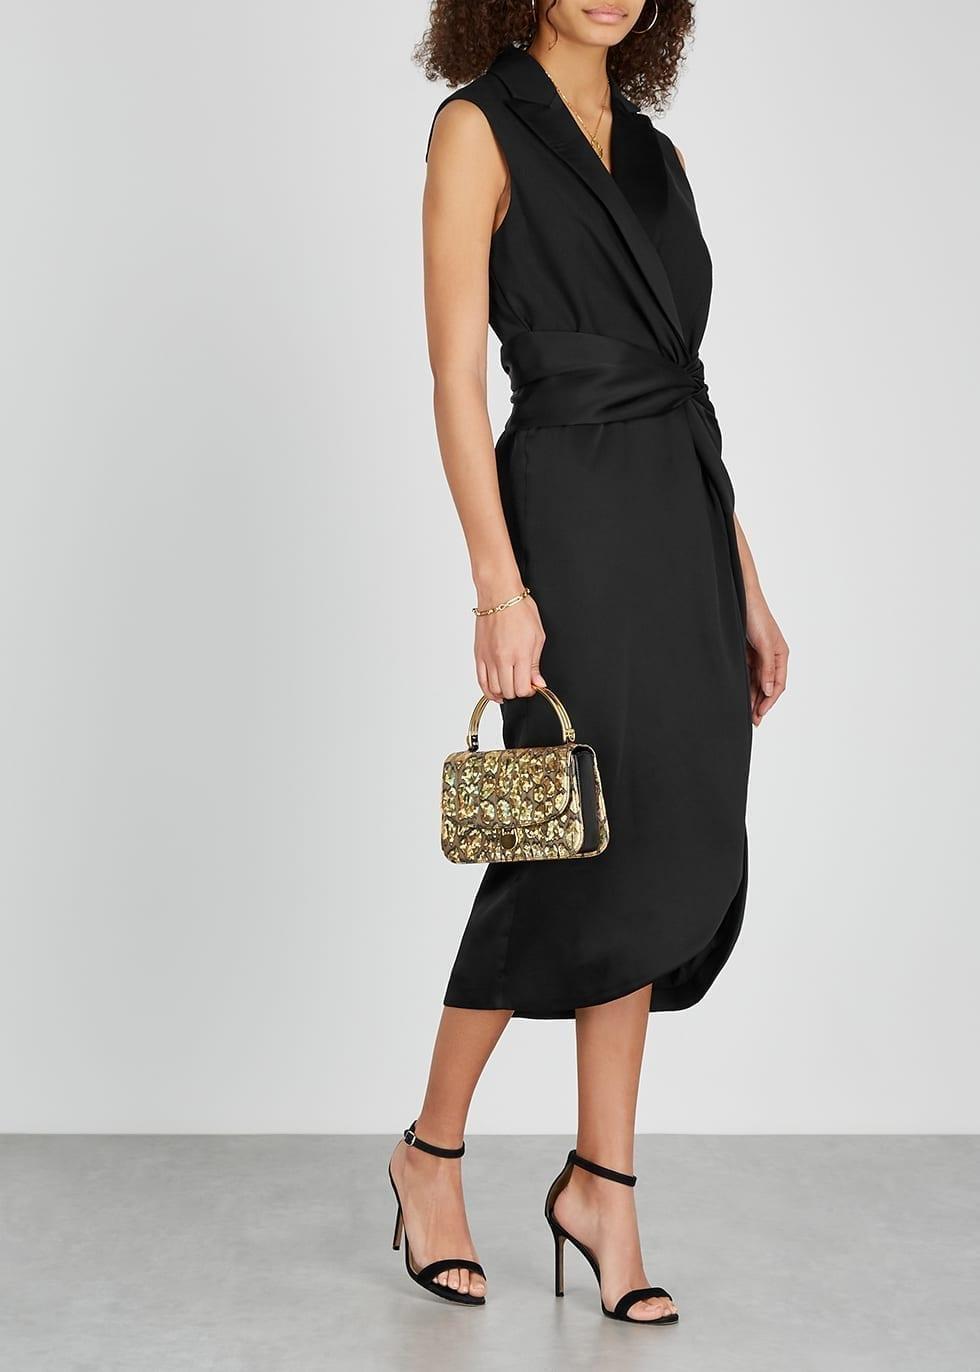 JONATHAN SIMKHAI Black Twist-effect Satin Midi Dress